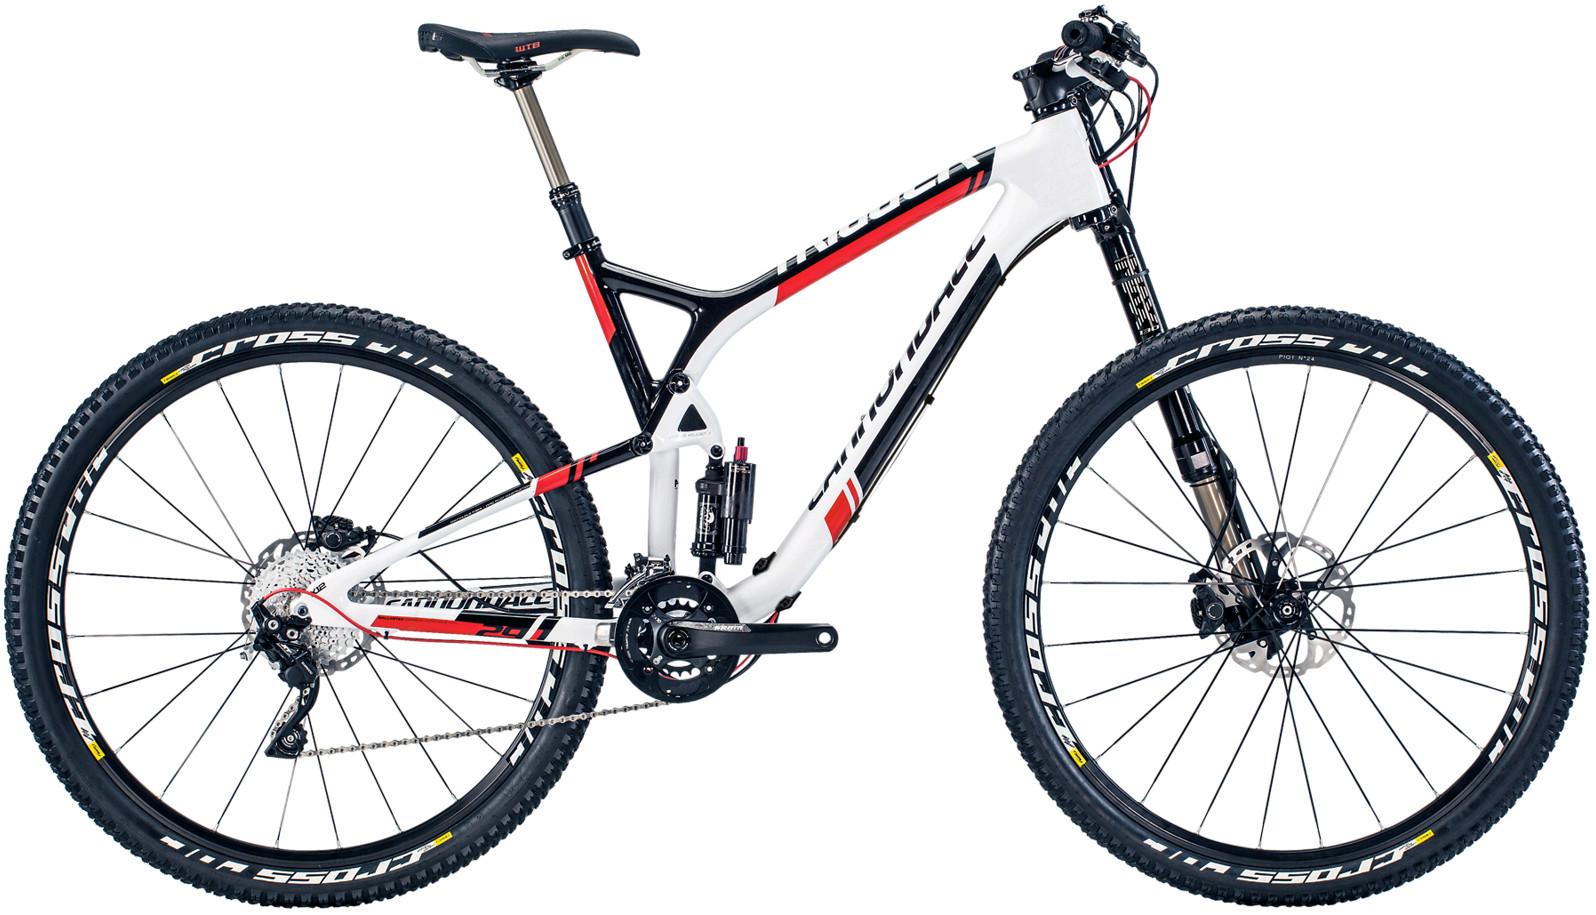 bike - 2014 Cannondale Trigger 29 Carbon 2